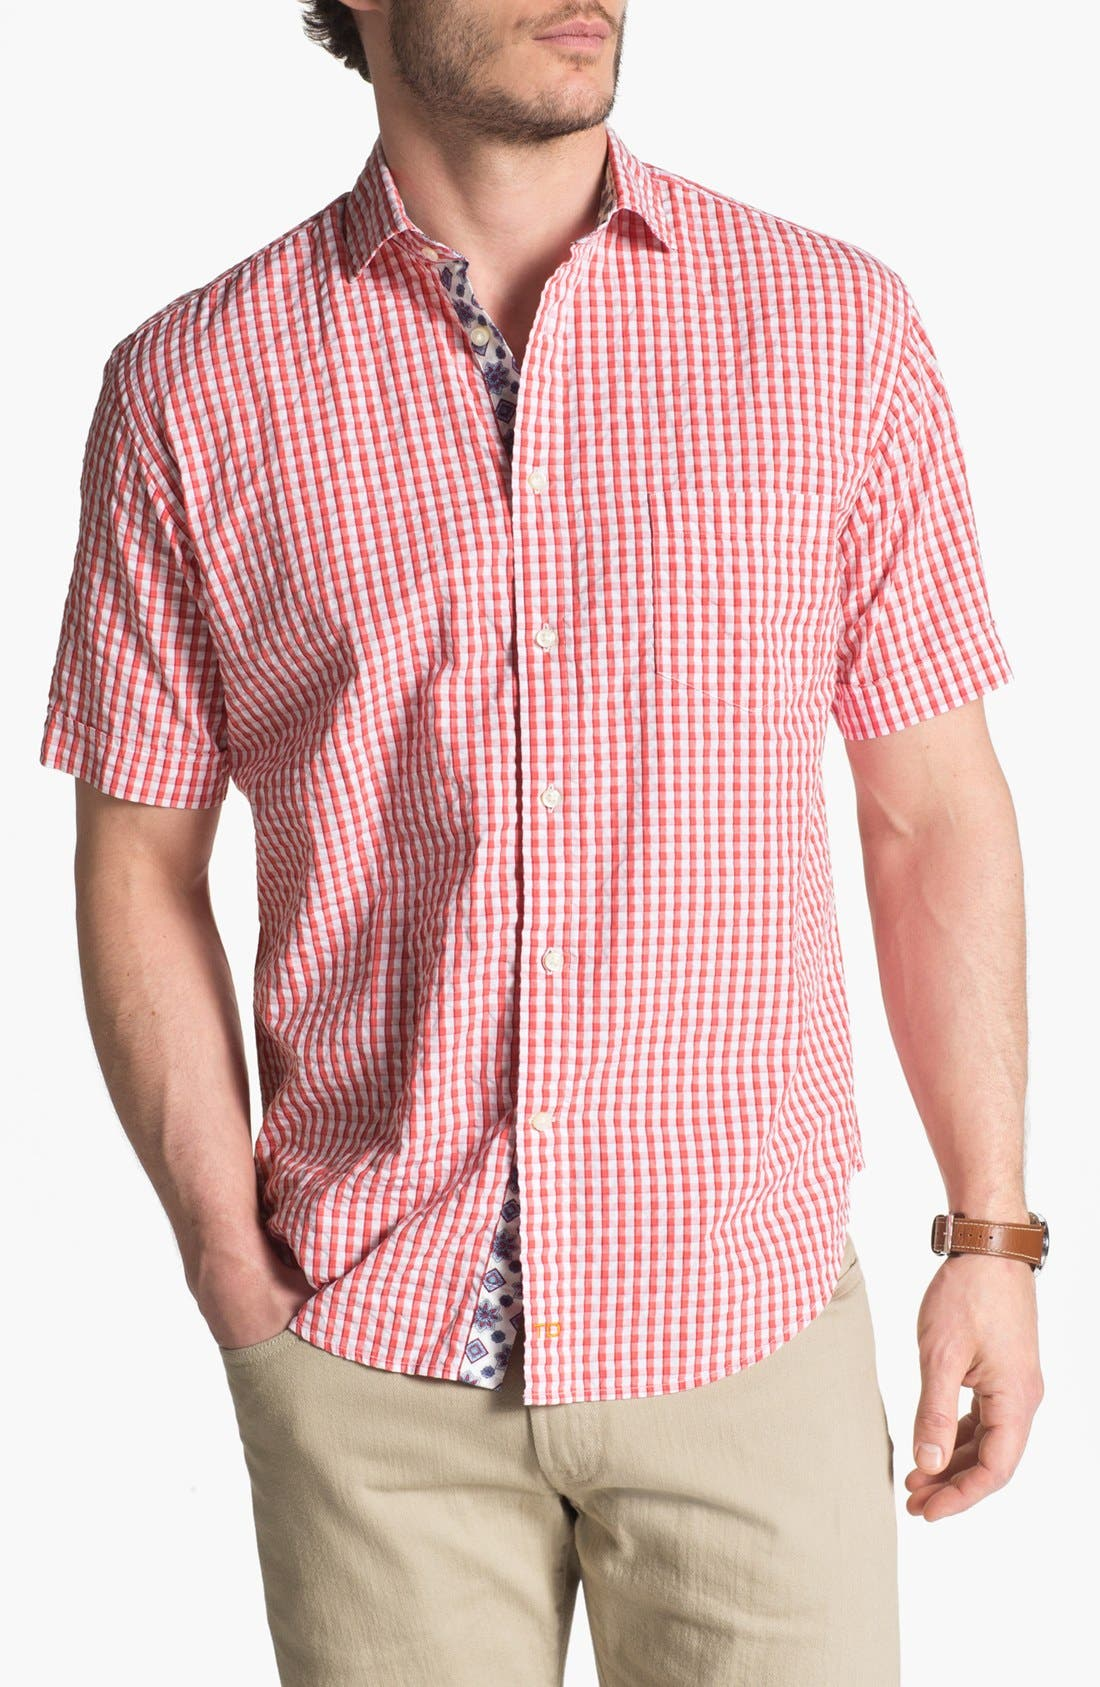 Alternate Image 1 Selected - Thomas Dean Seersucker Sport Shirt